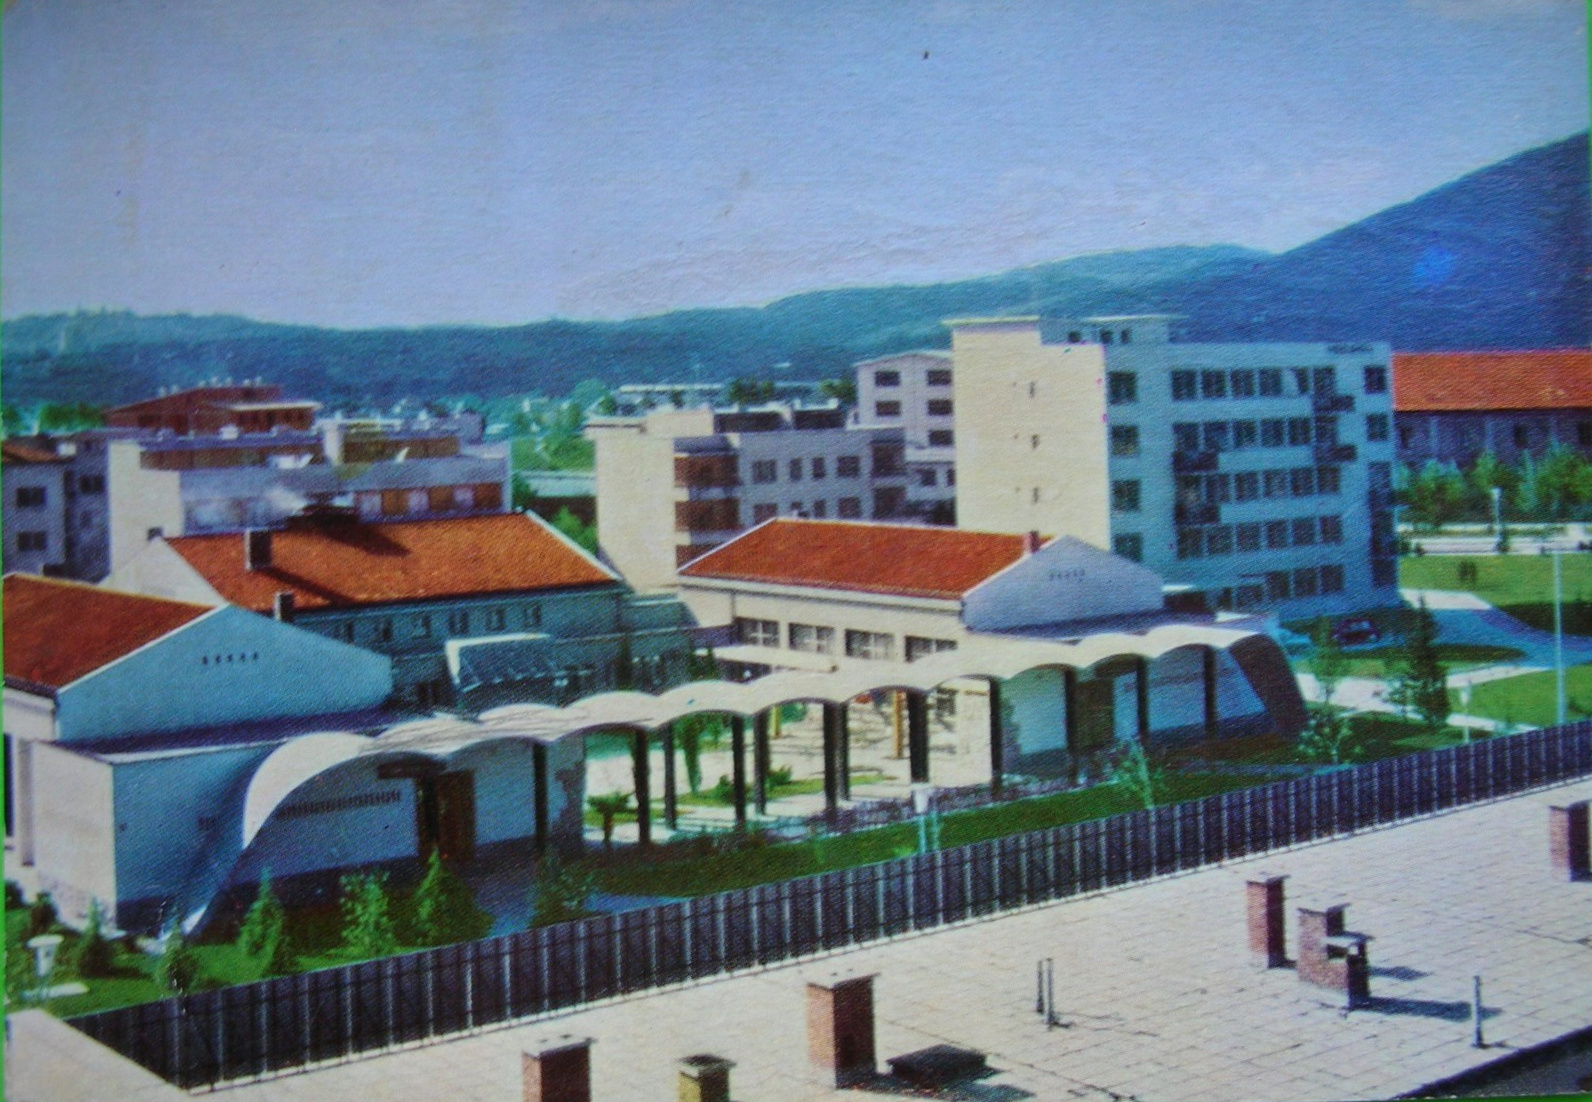 Hotel Park Nova Gorica